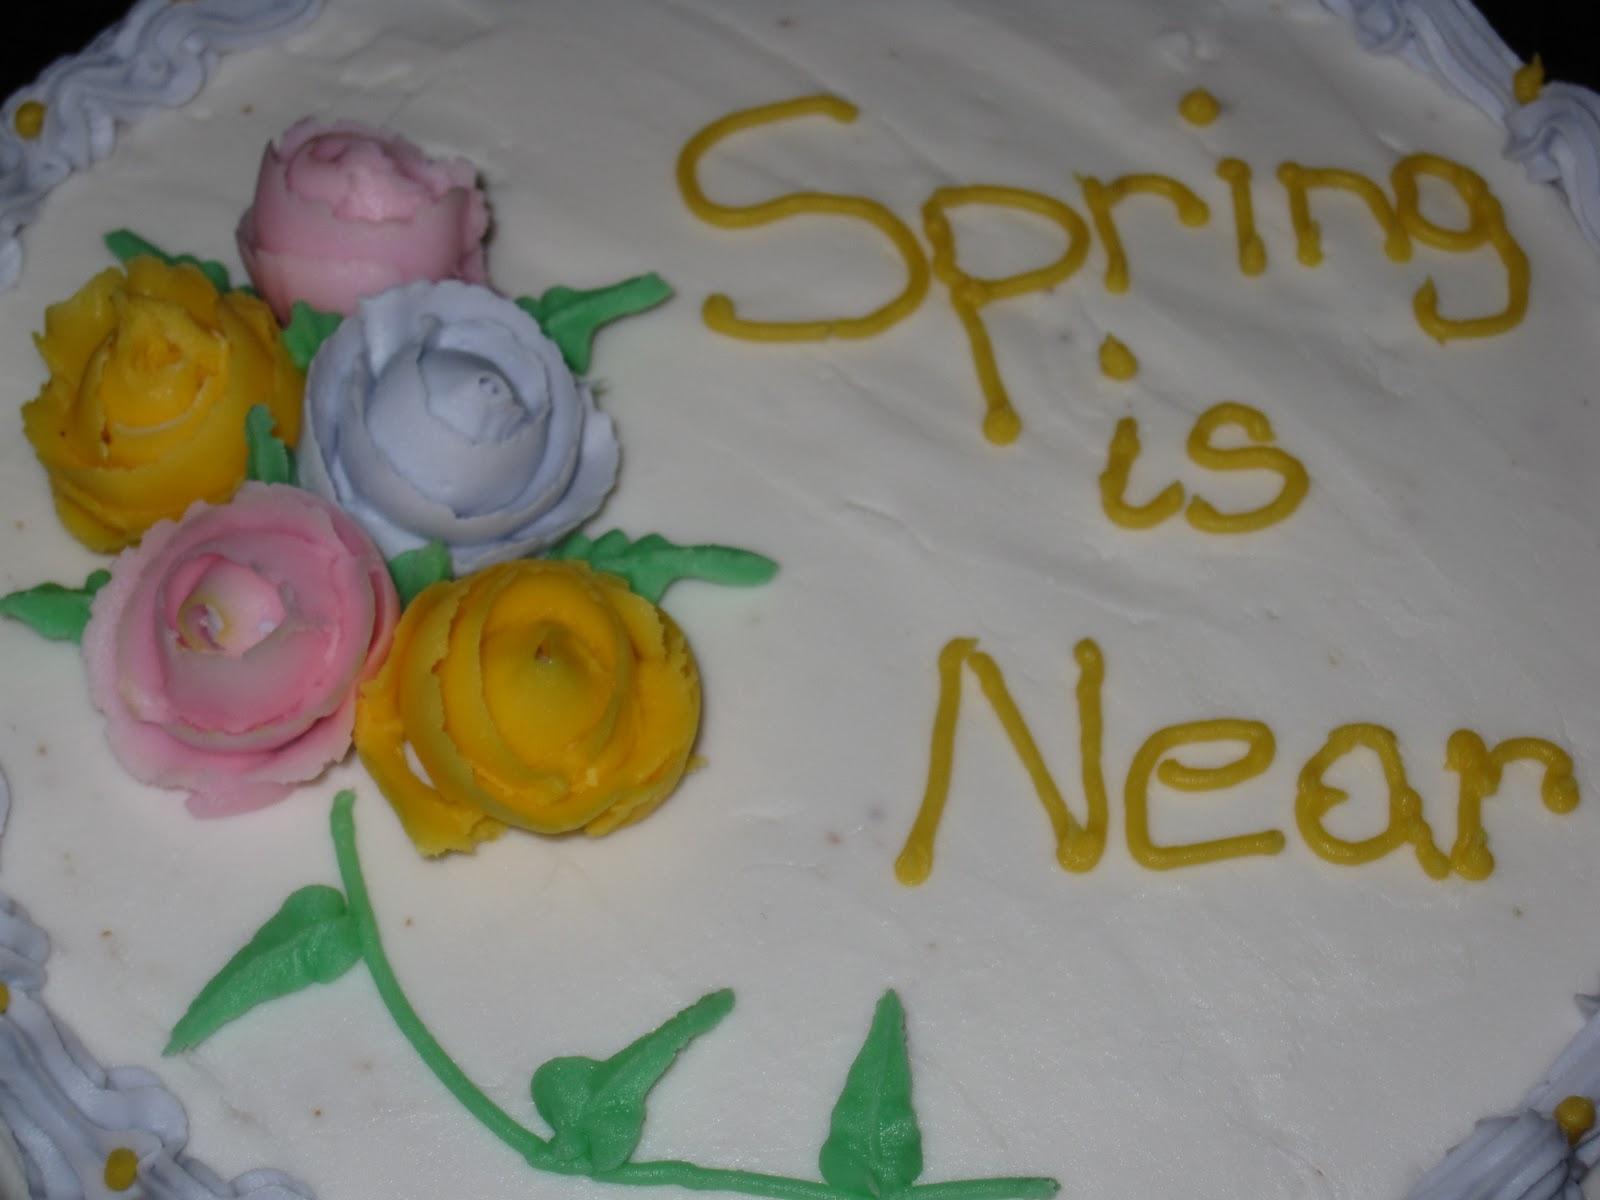 Cake Decorating Class Michaels smartprosus